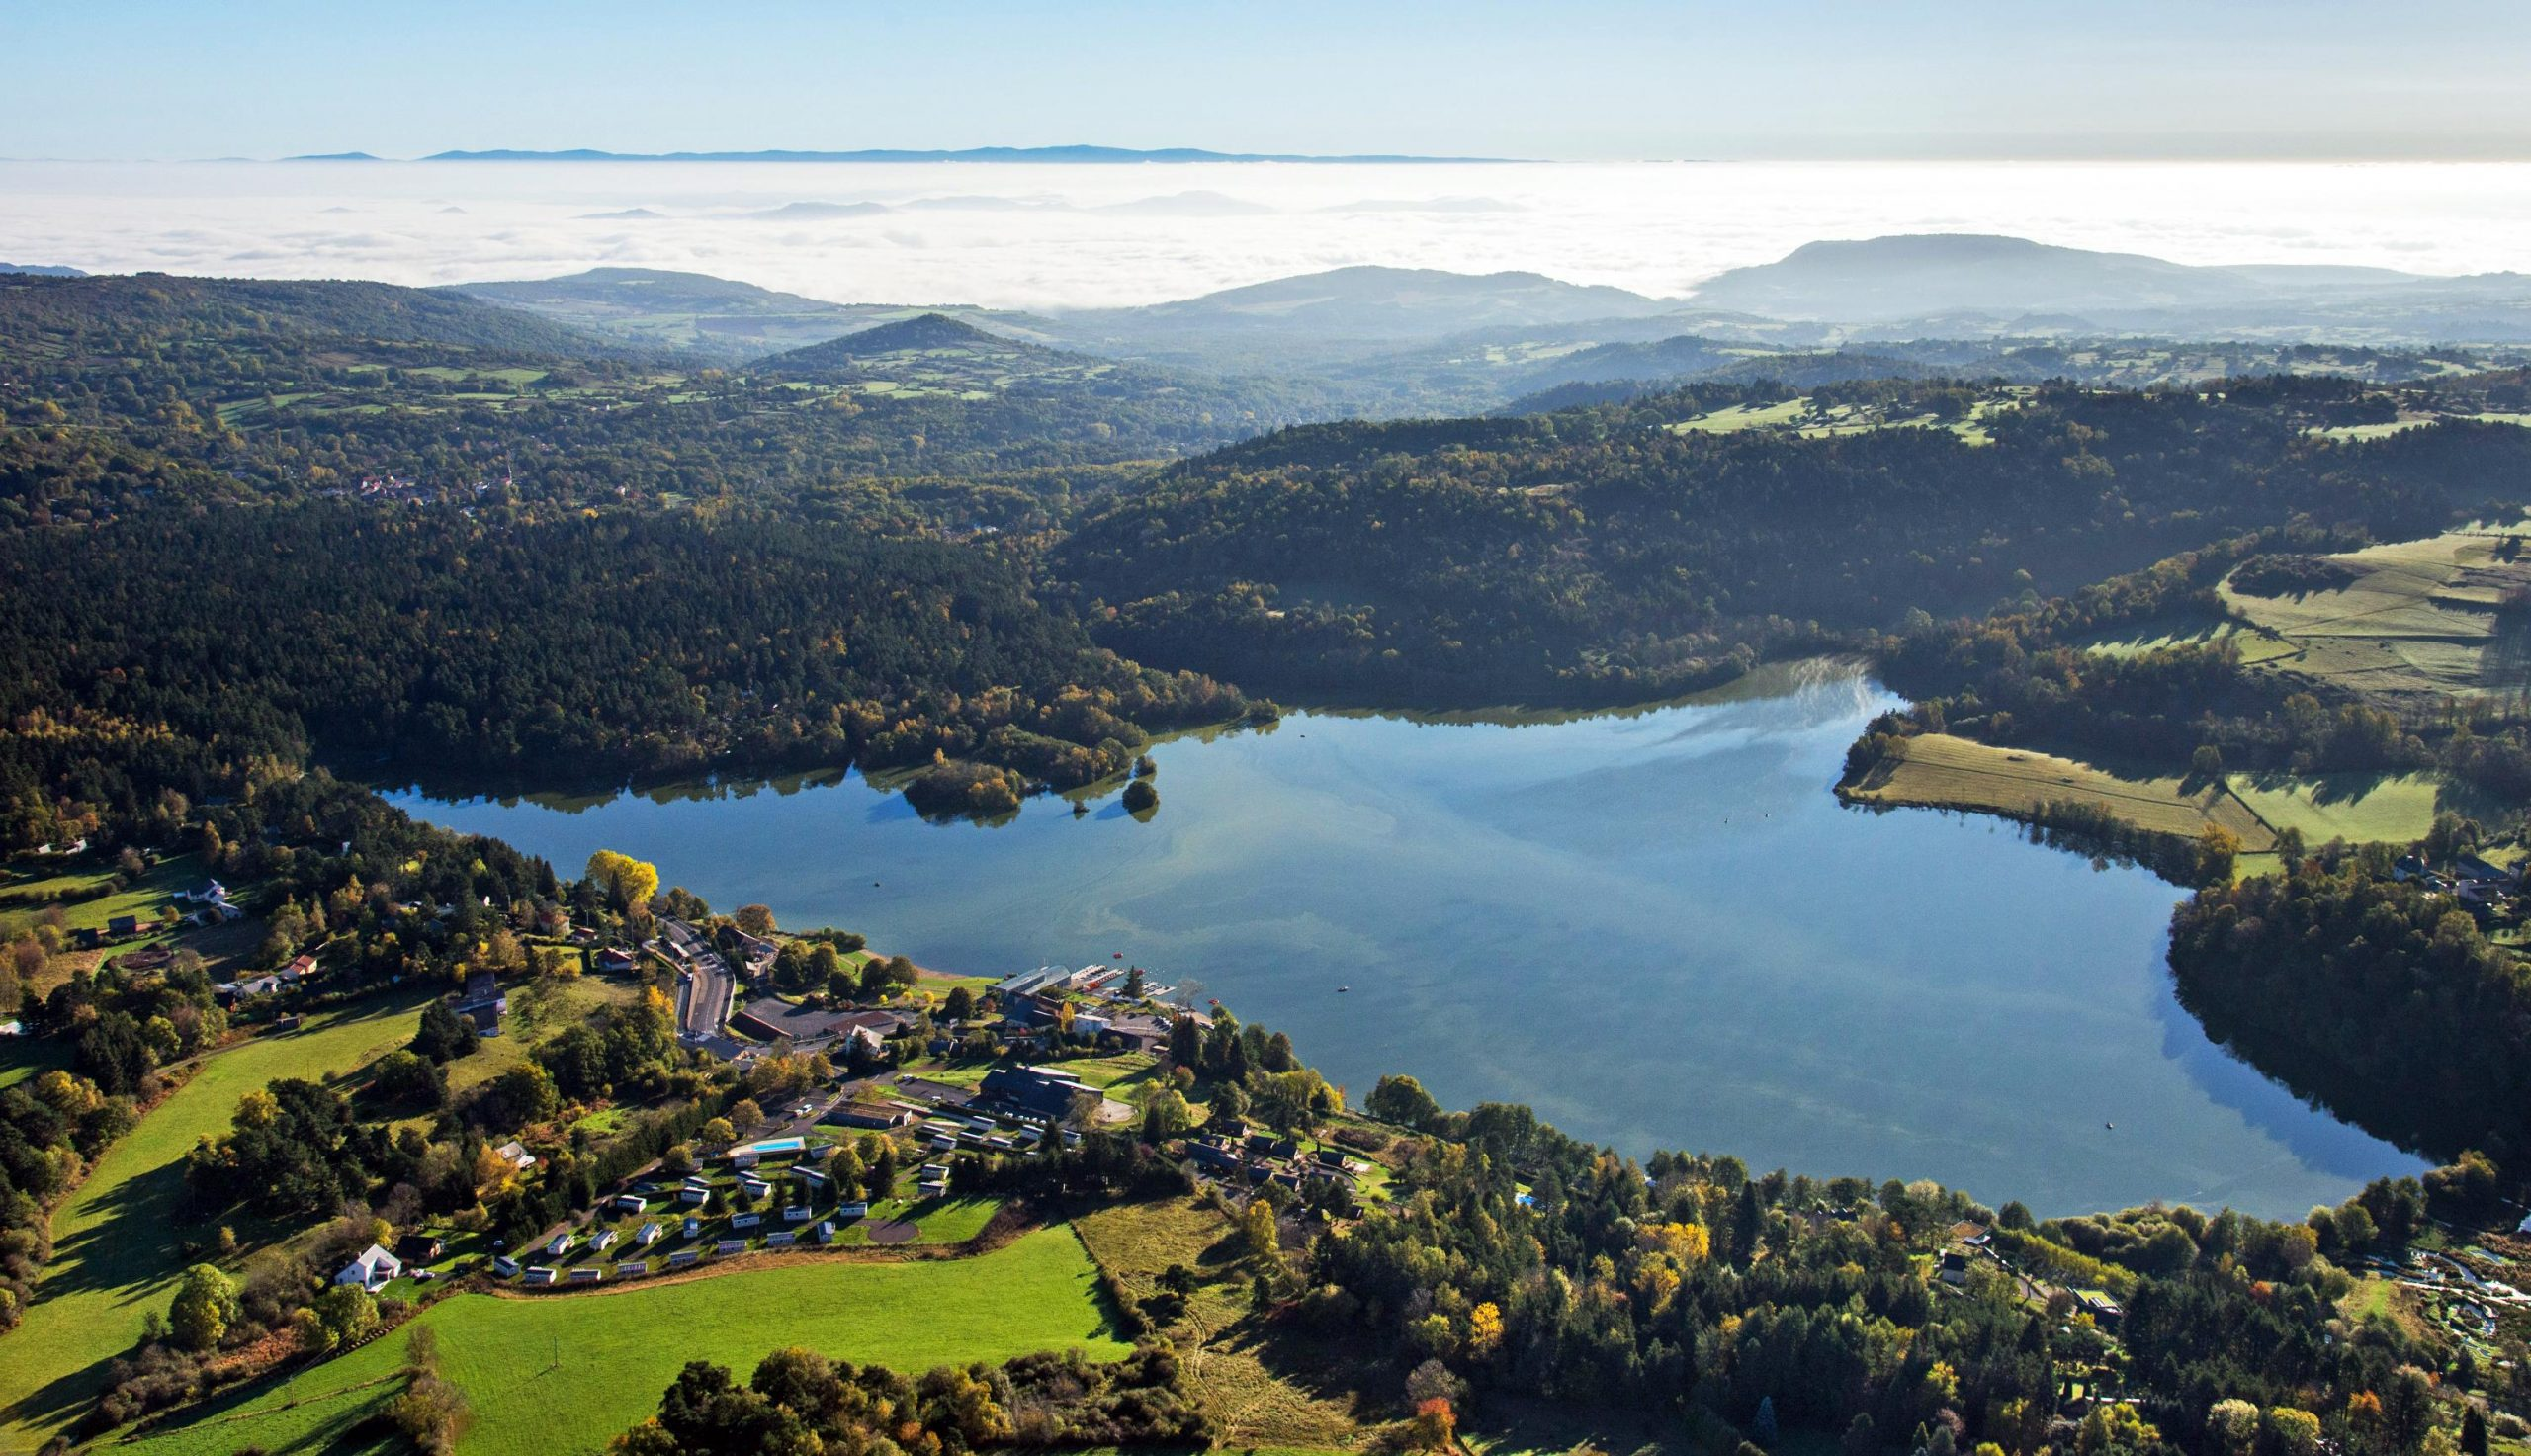 Aydat Lake in Auvergne